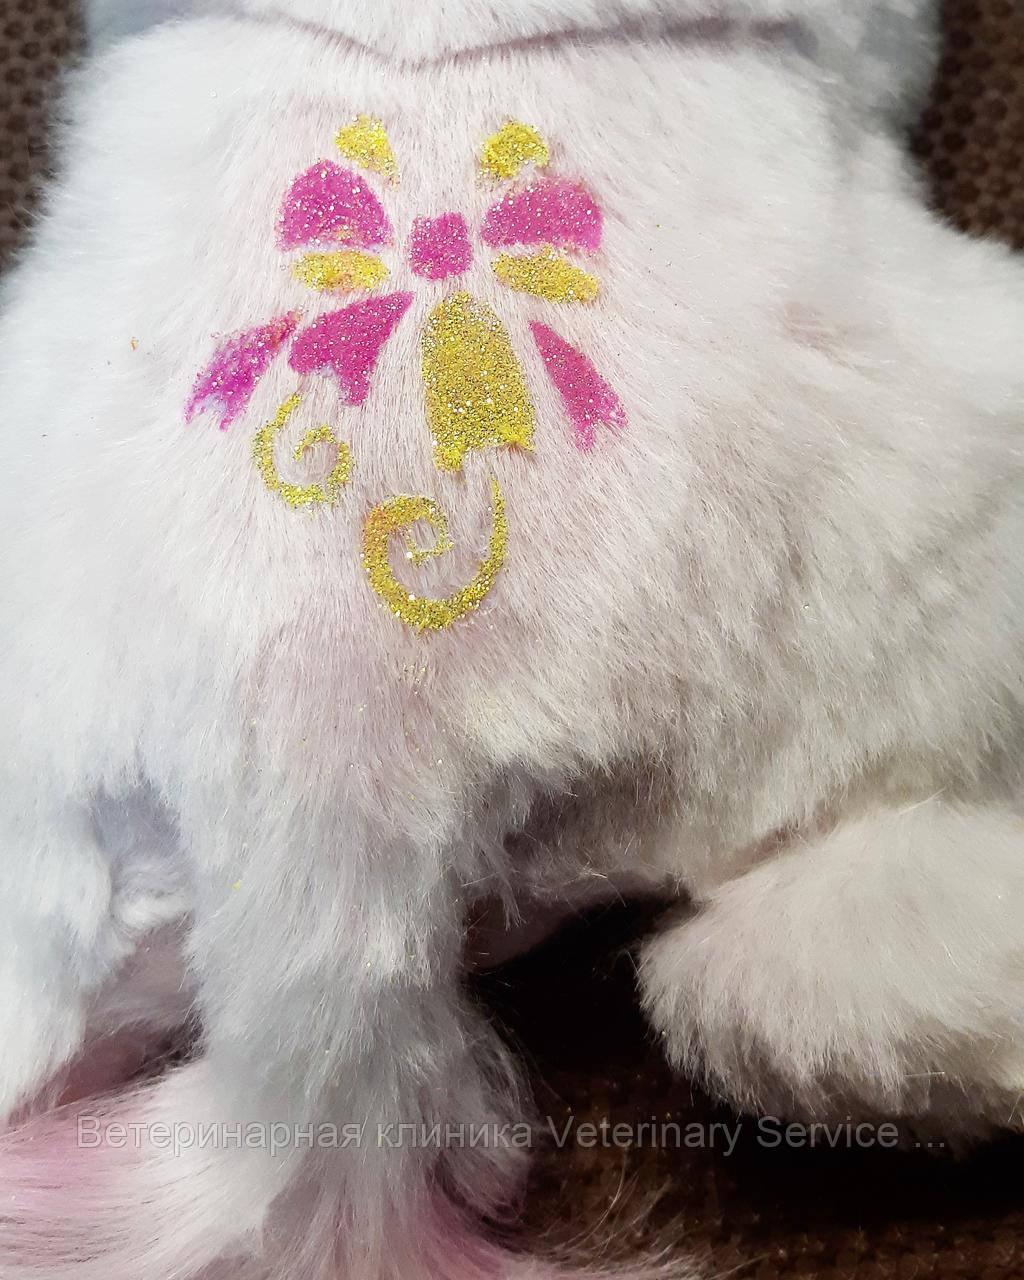 Дизайн на шерсти животного (Покраска шерсти)